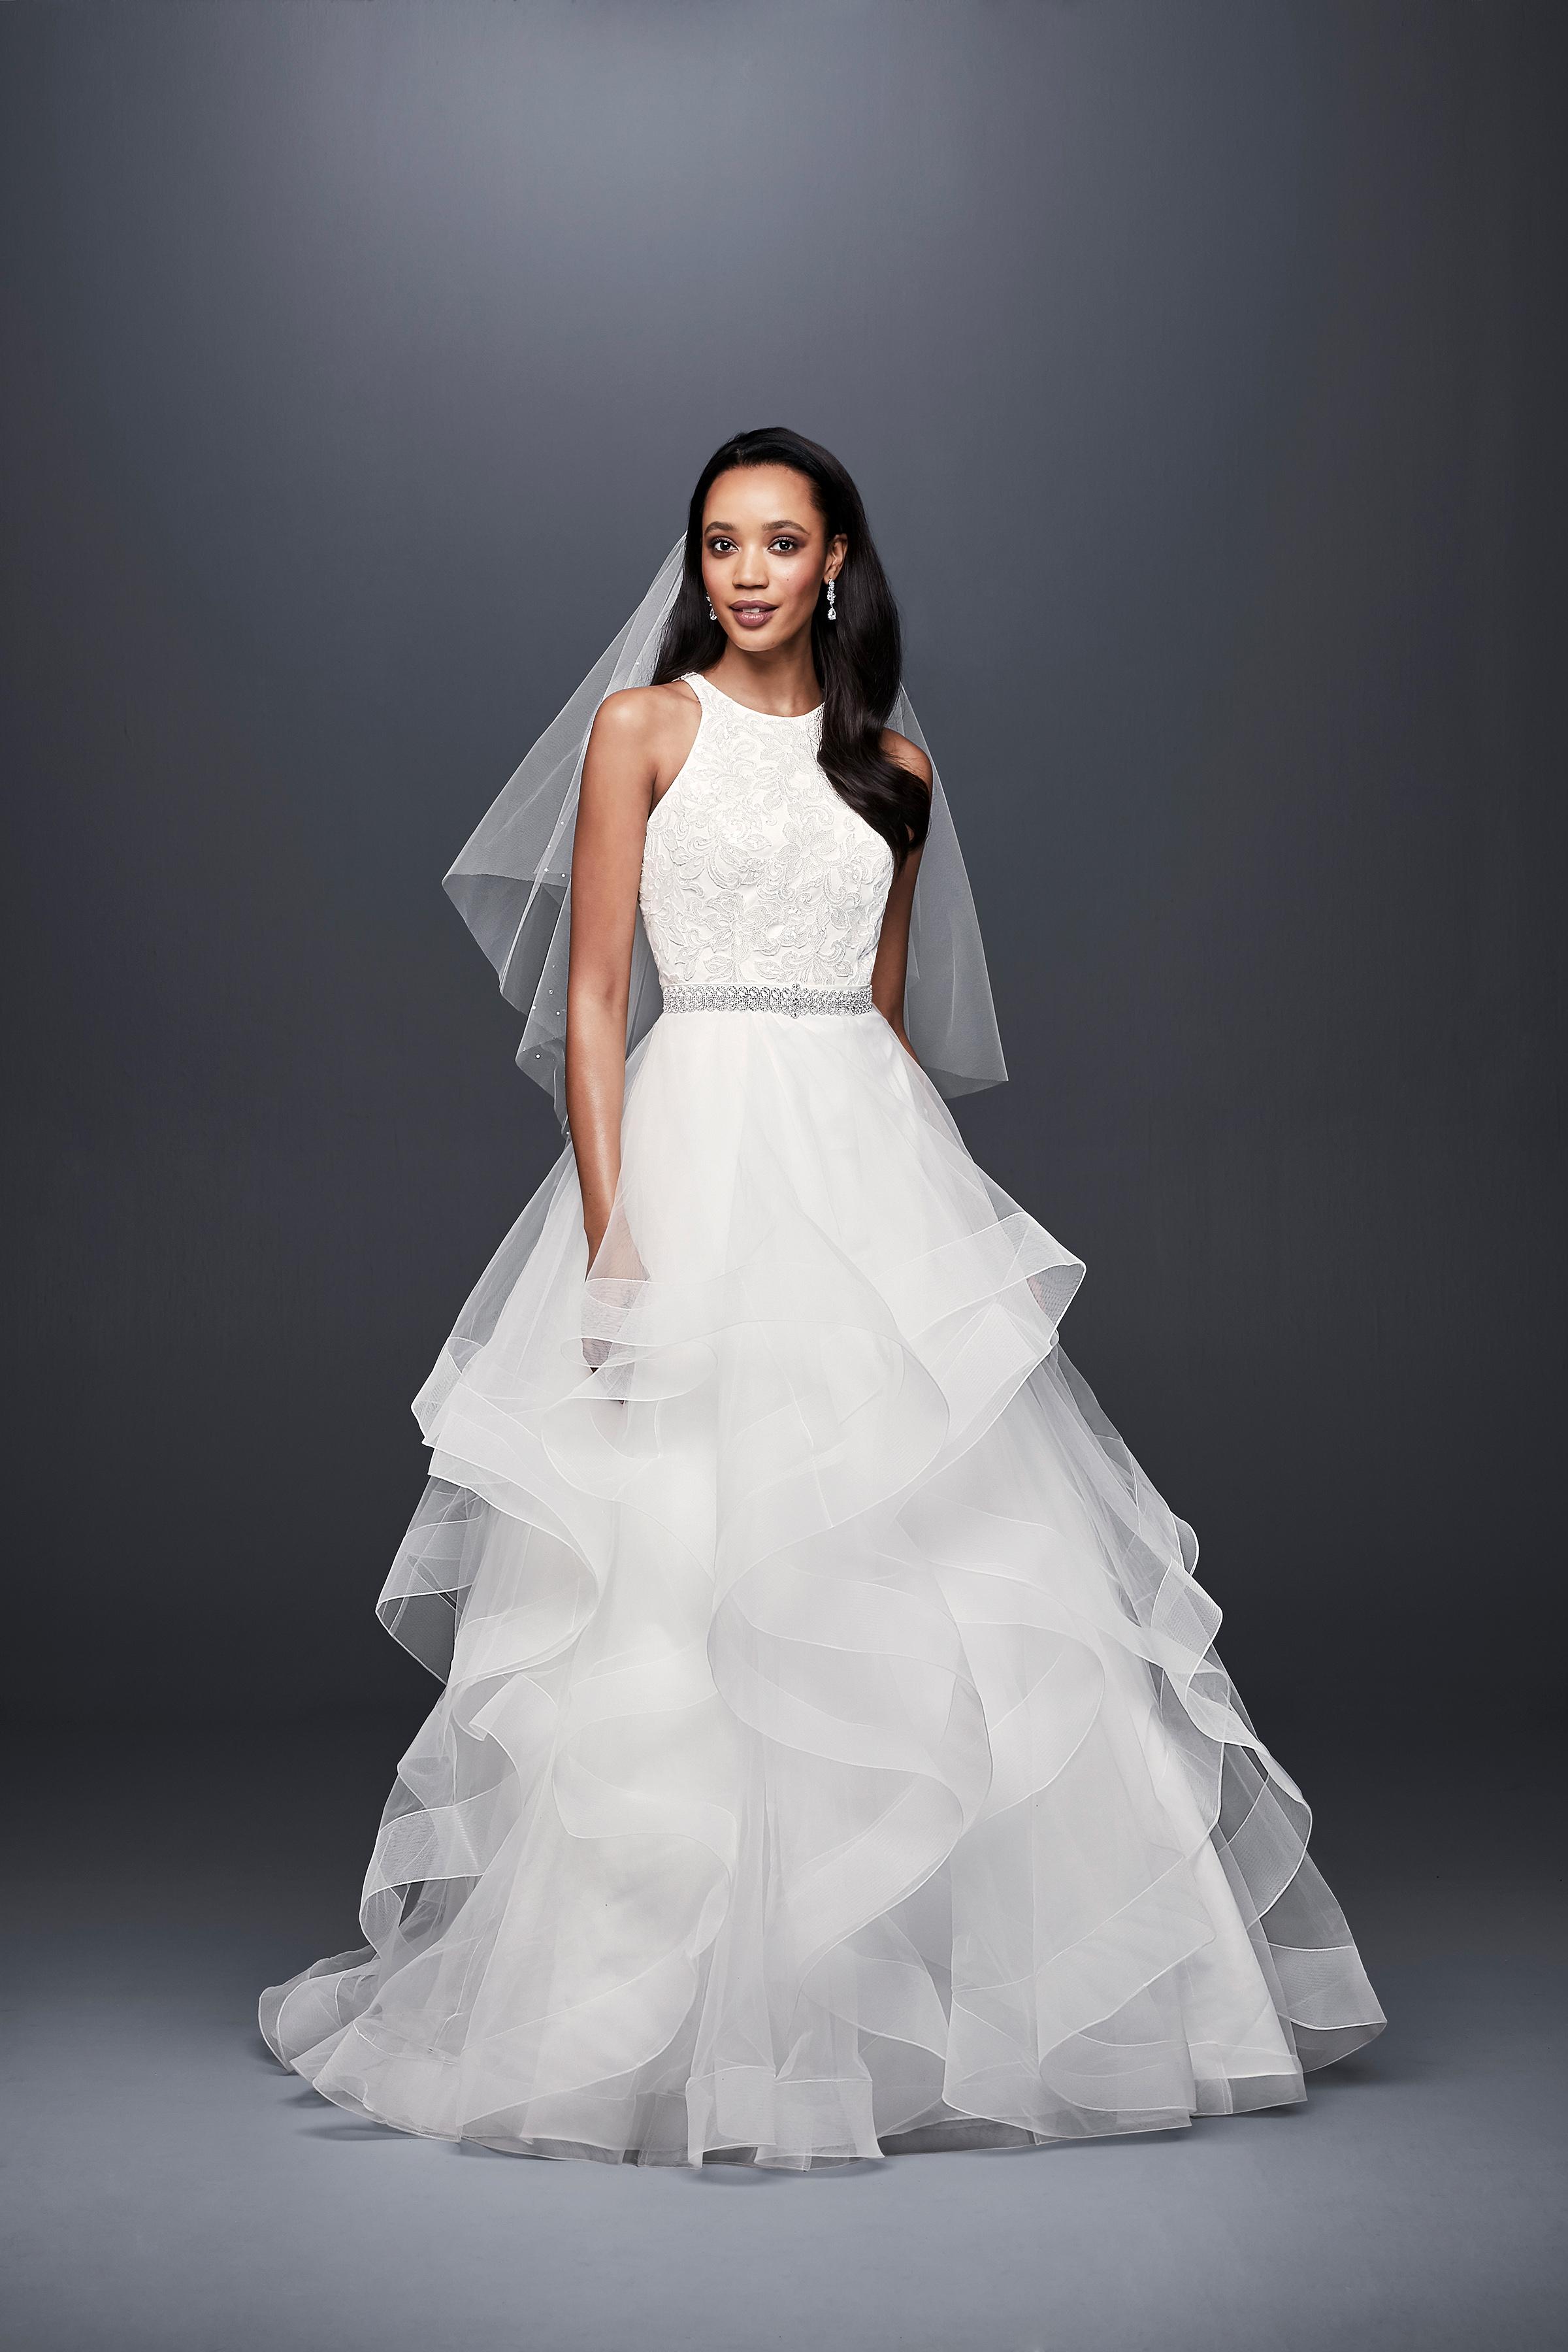 david bridal wedding dress spring 2019 tiers beaded belt sleeveless